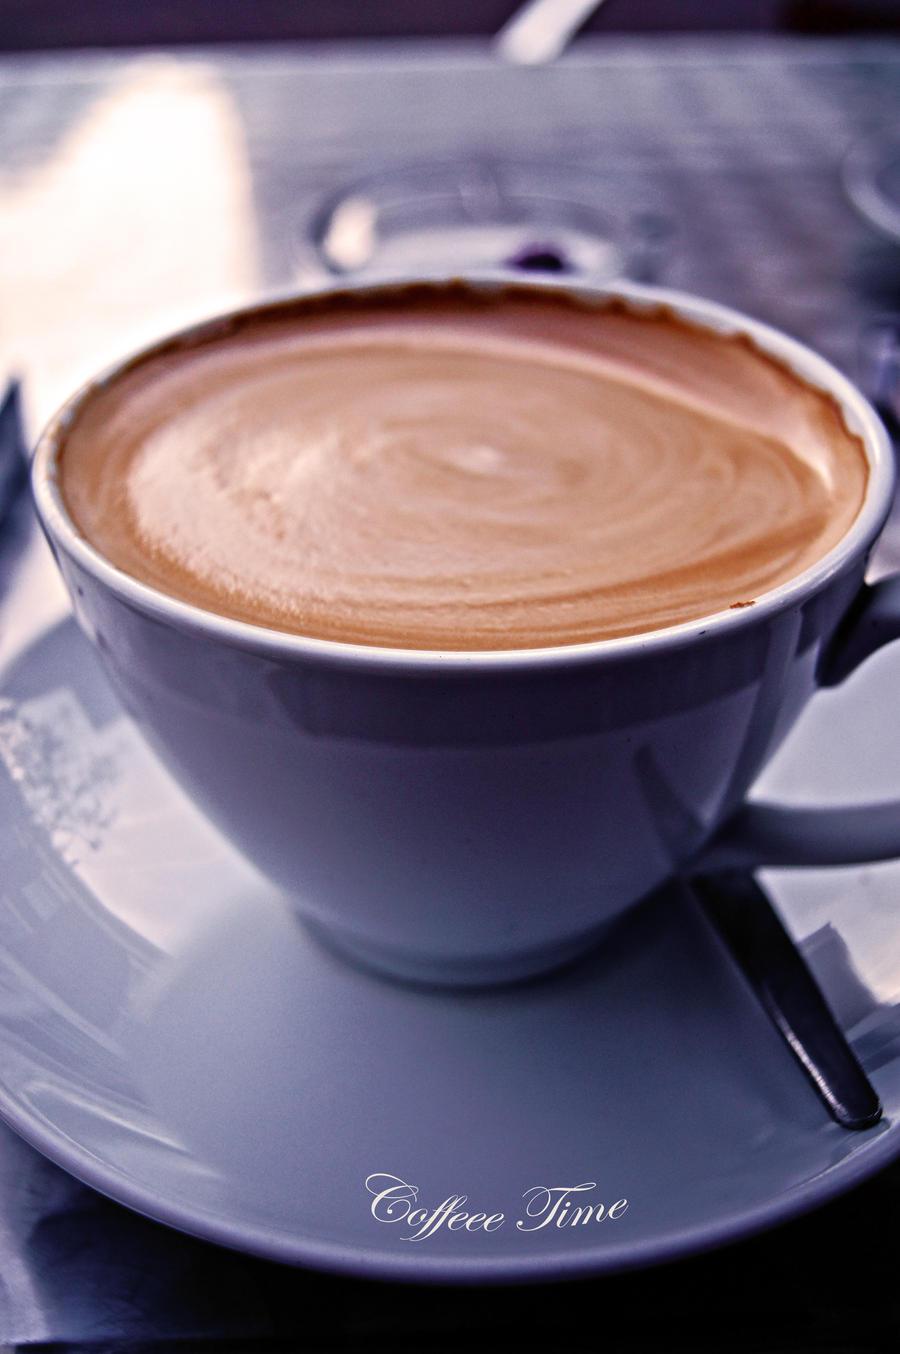 Coffee Time by Nittaaaa